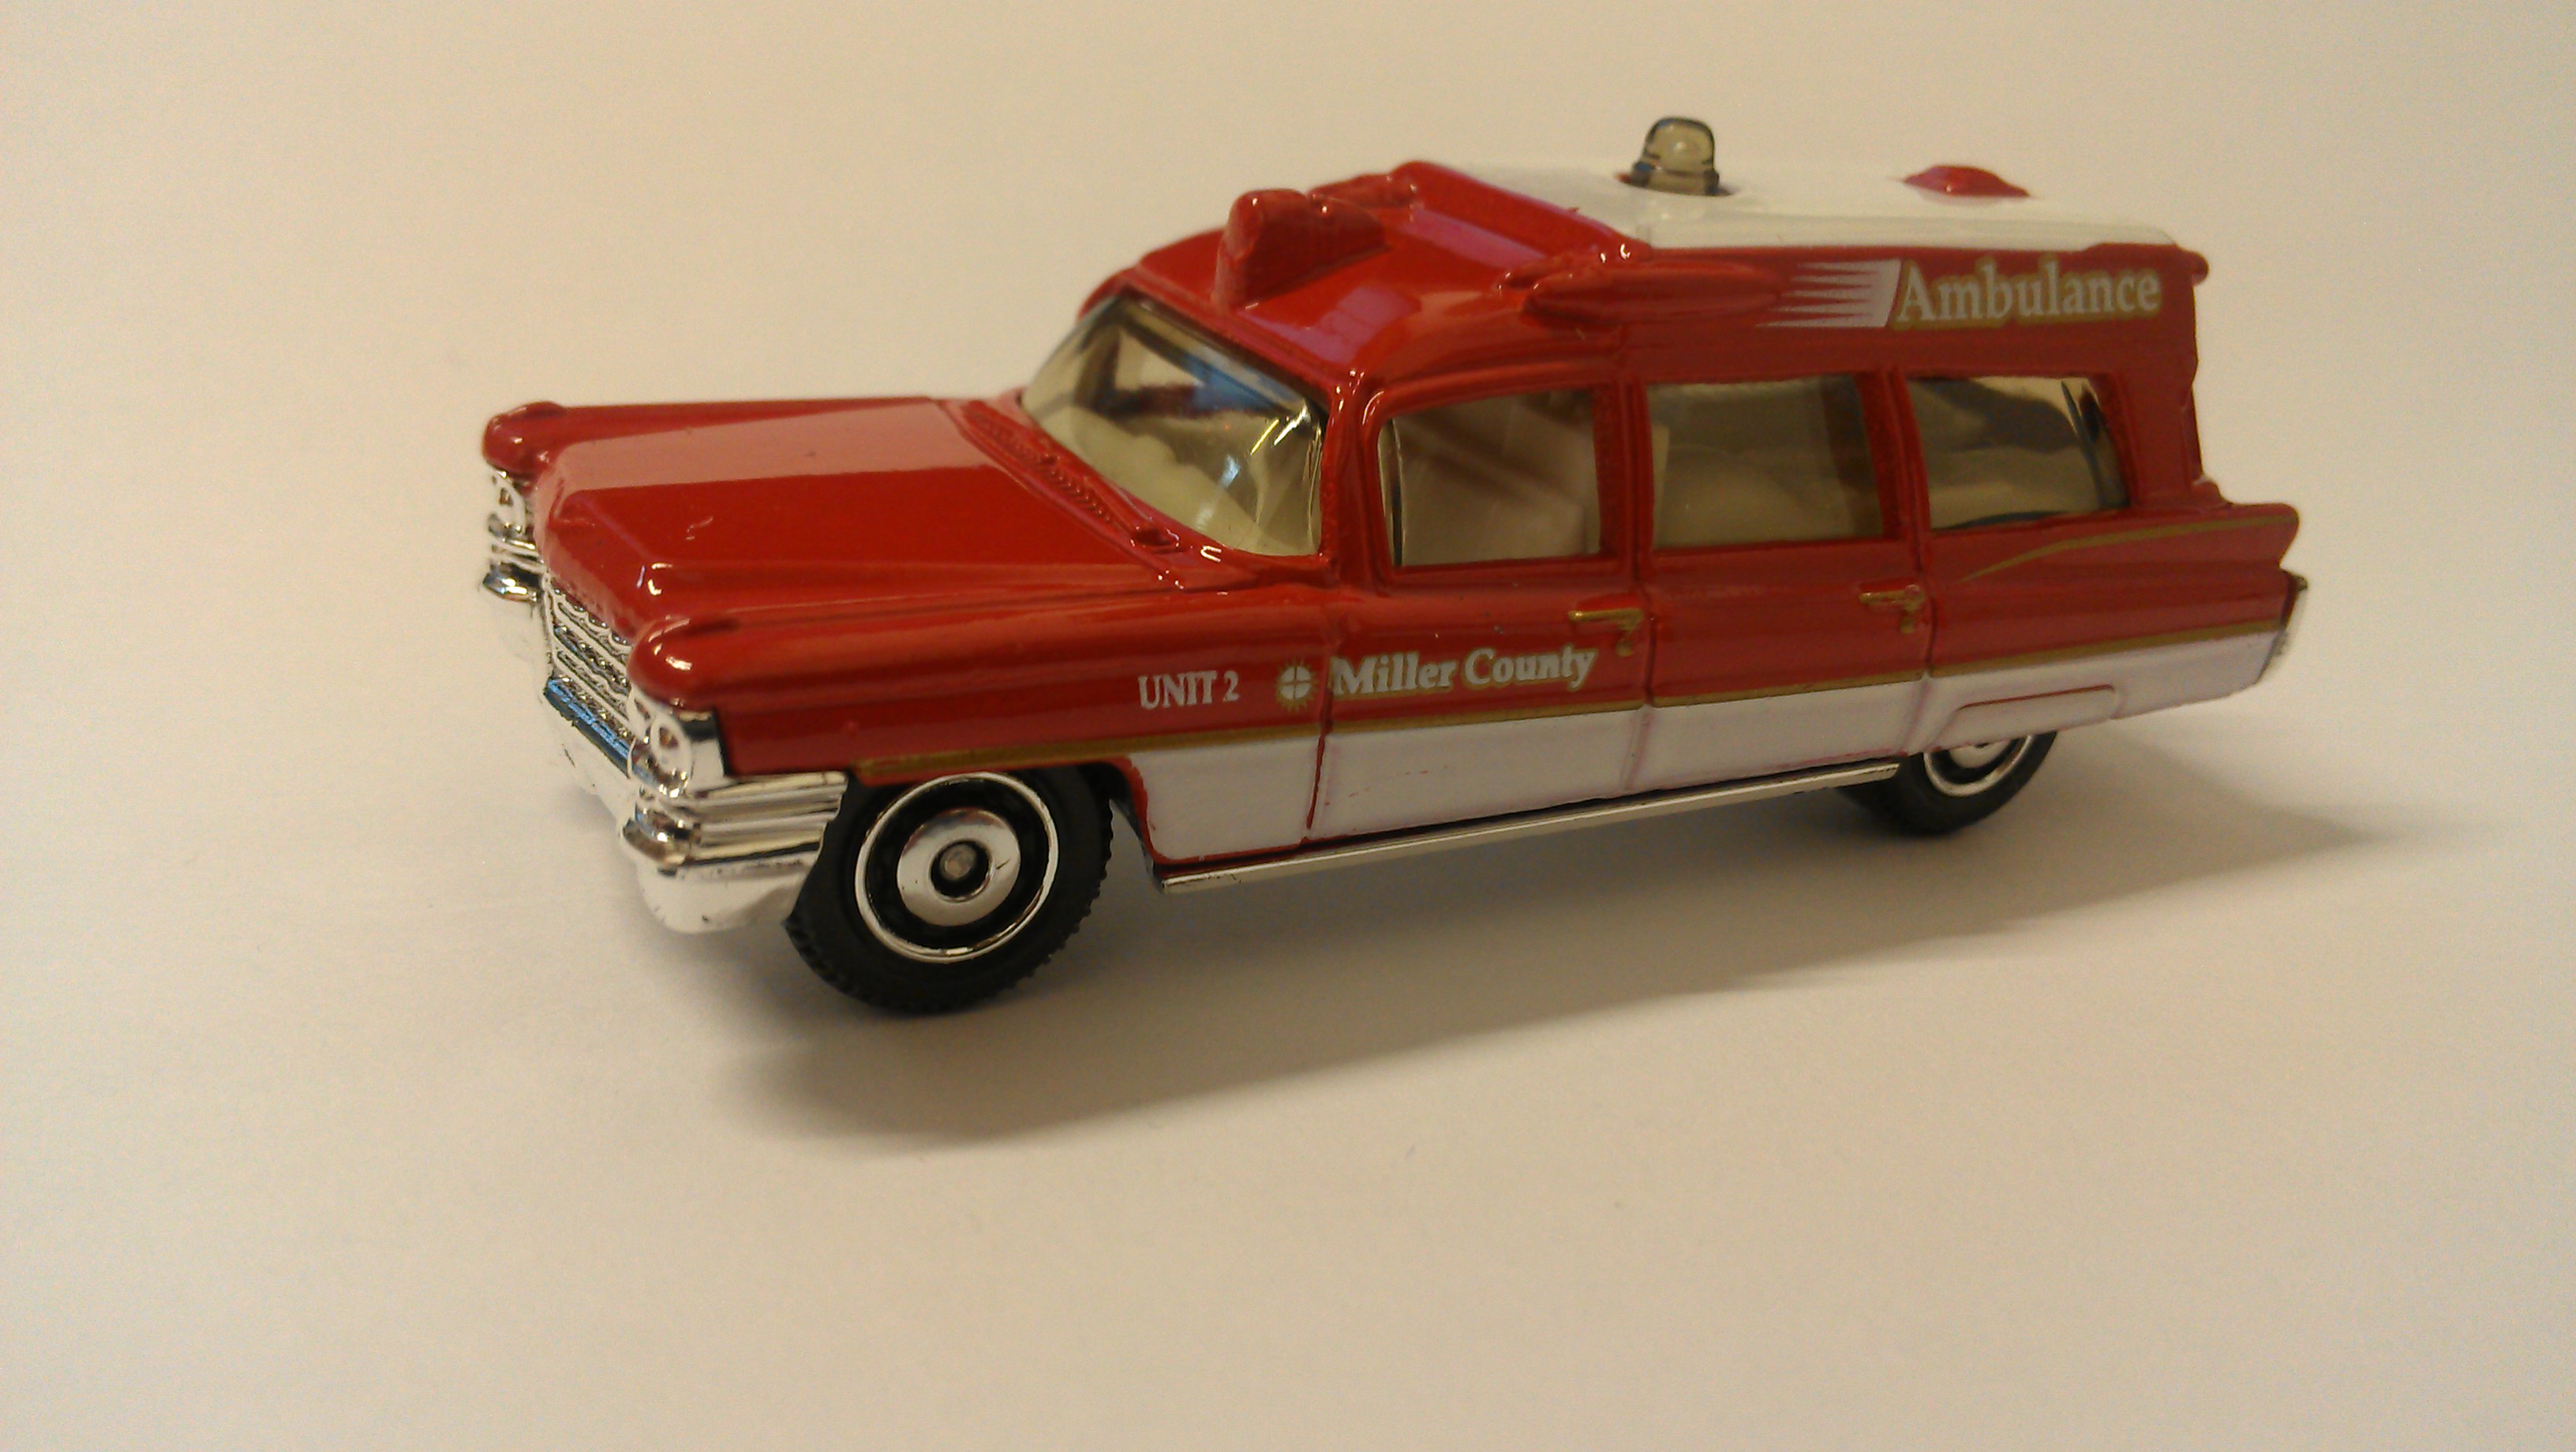 NEW 2010 Matchbox Cars /'63 Cadillac Ambulance 1:81